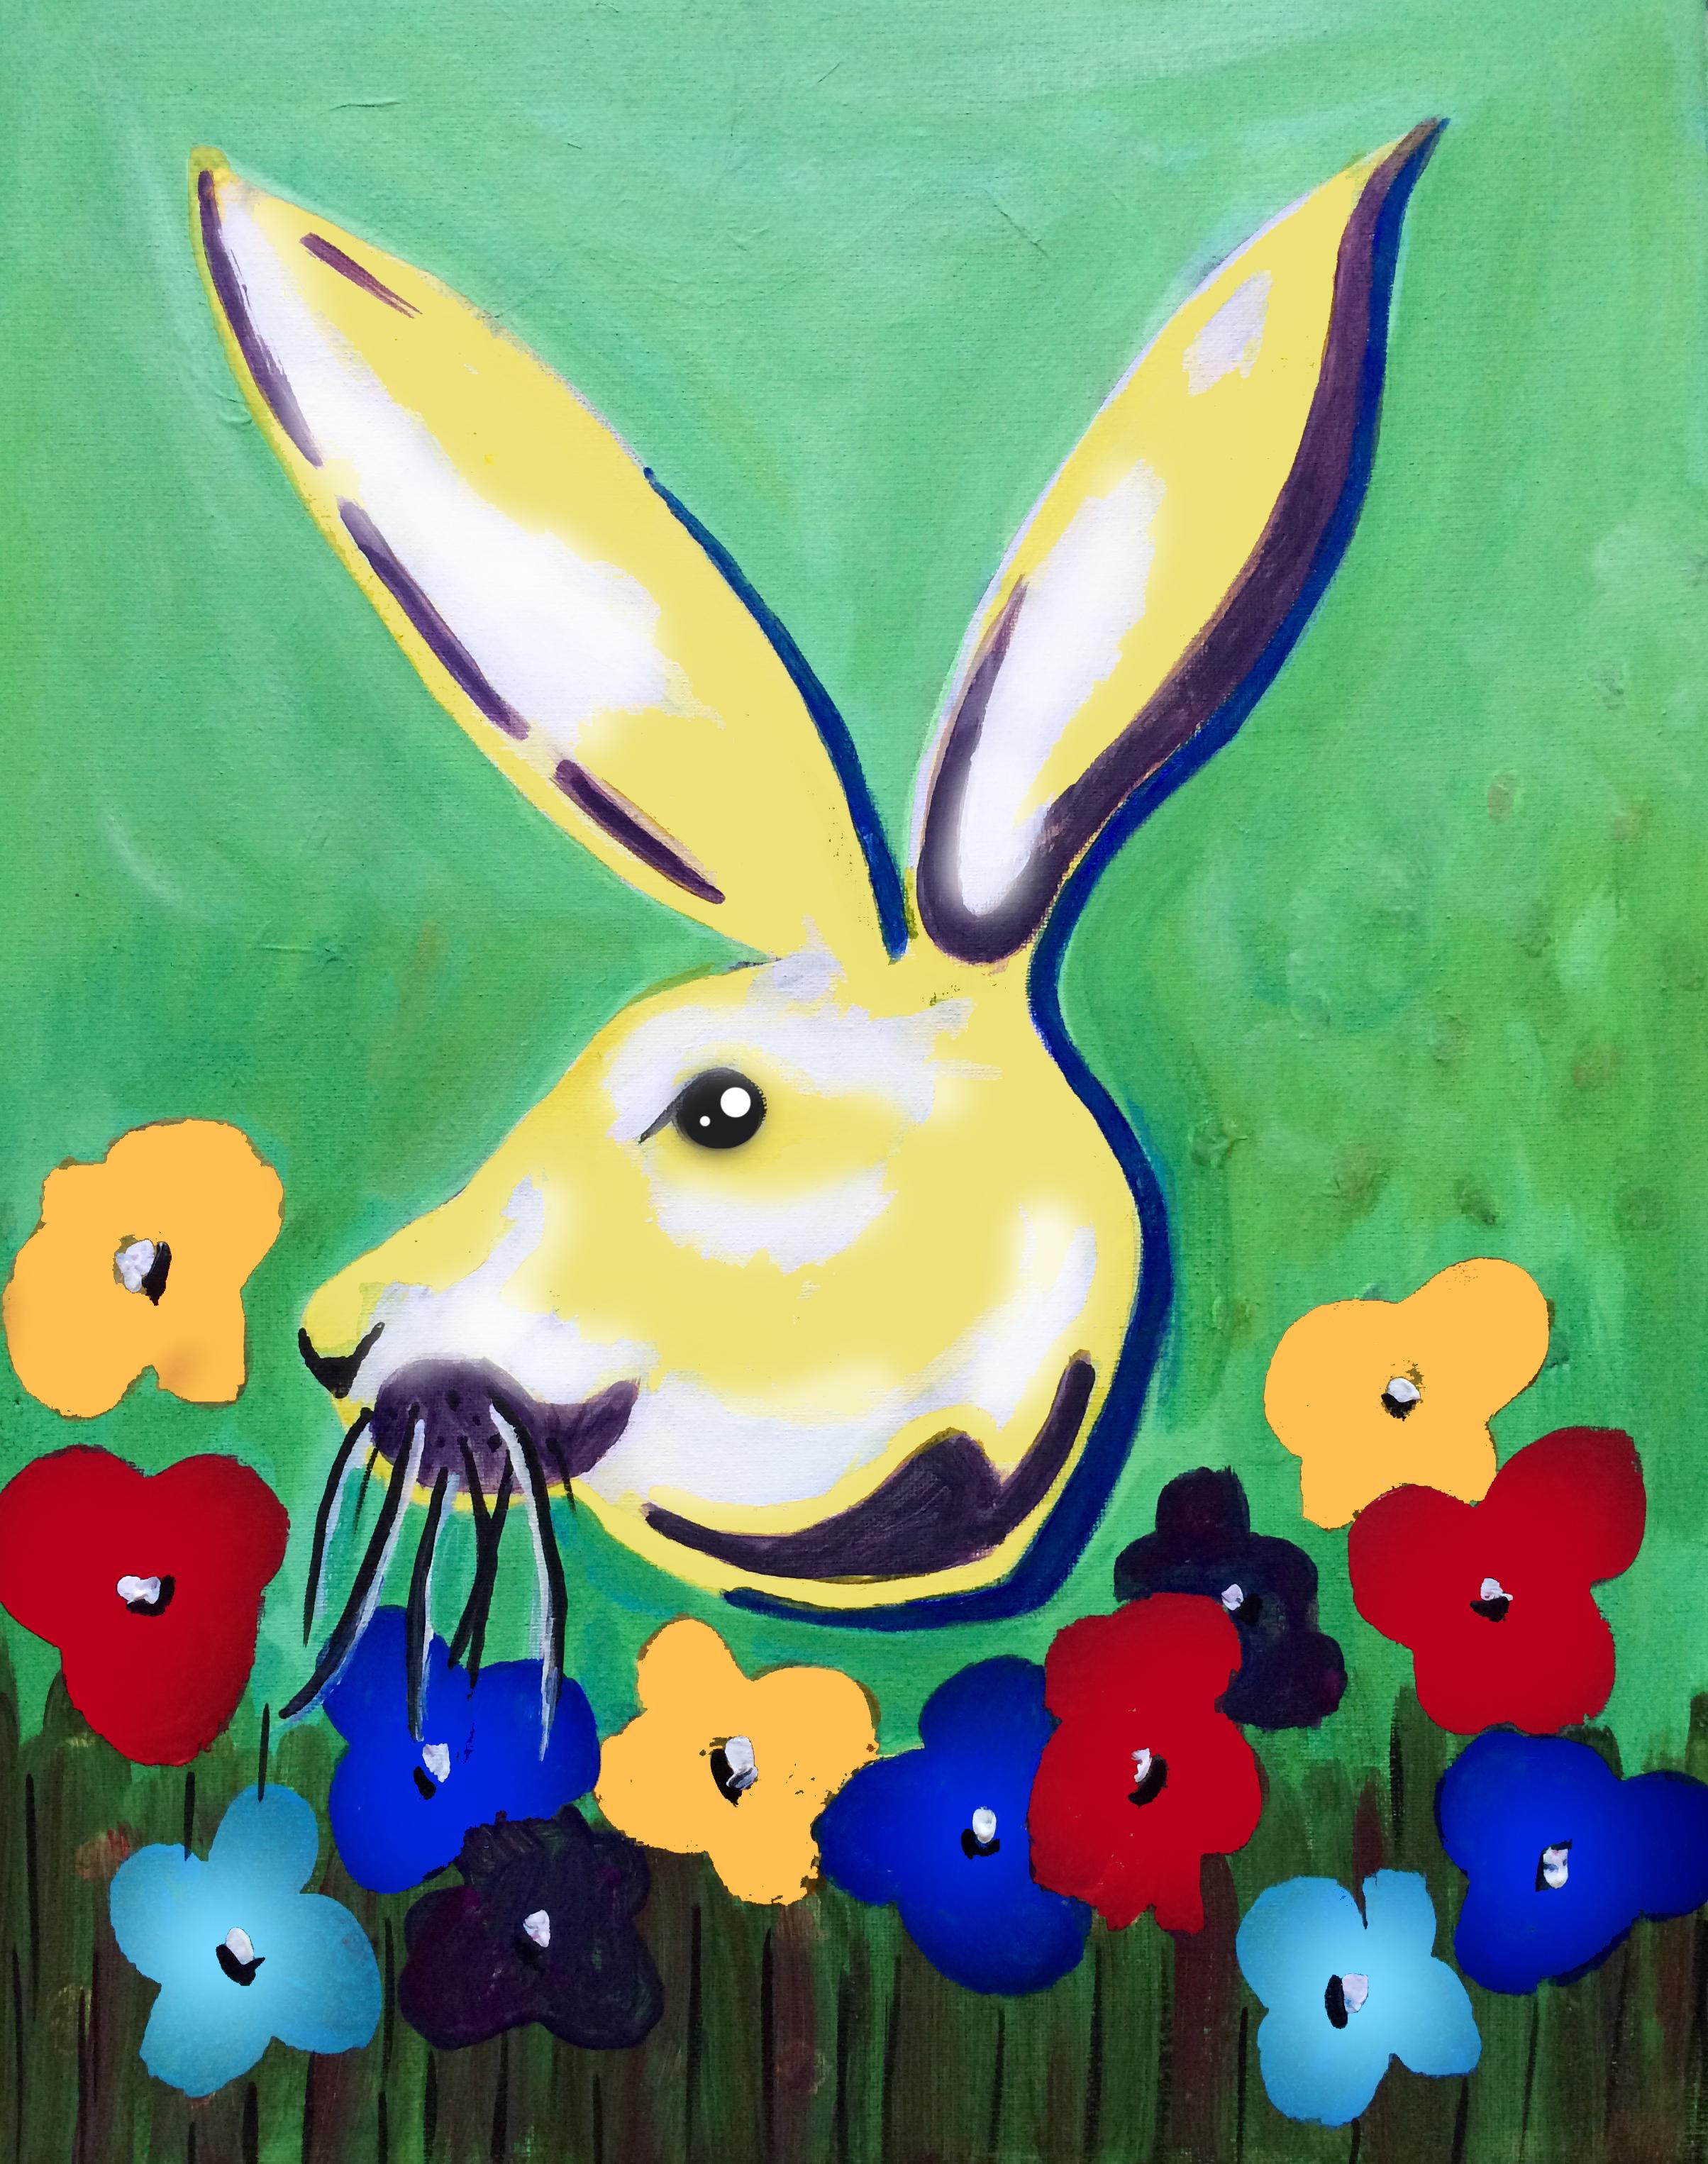 Easter bunny rabbit pop art painting